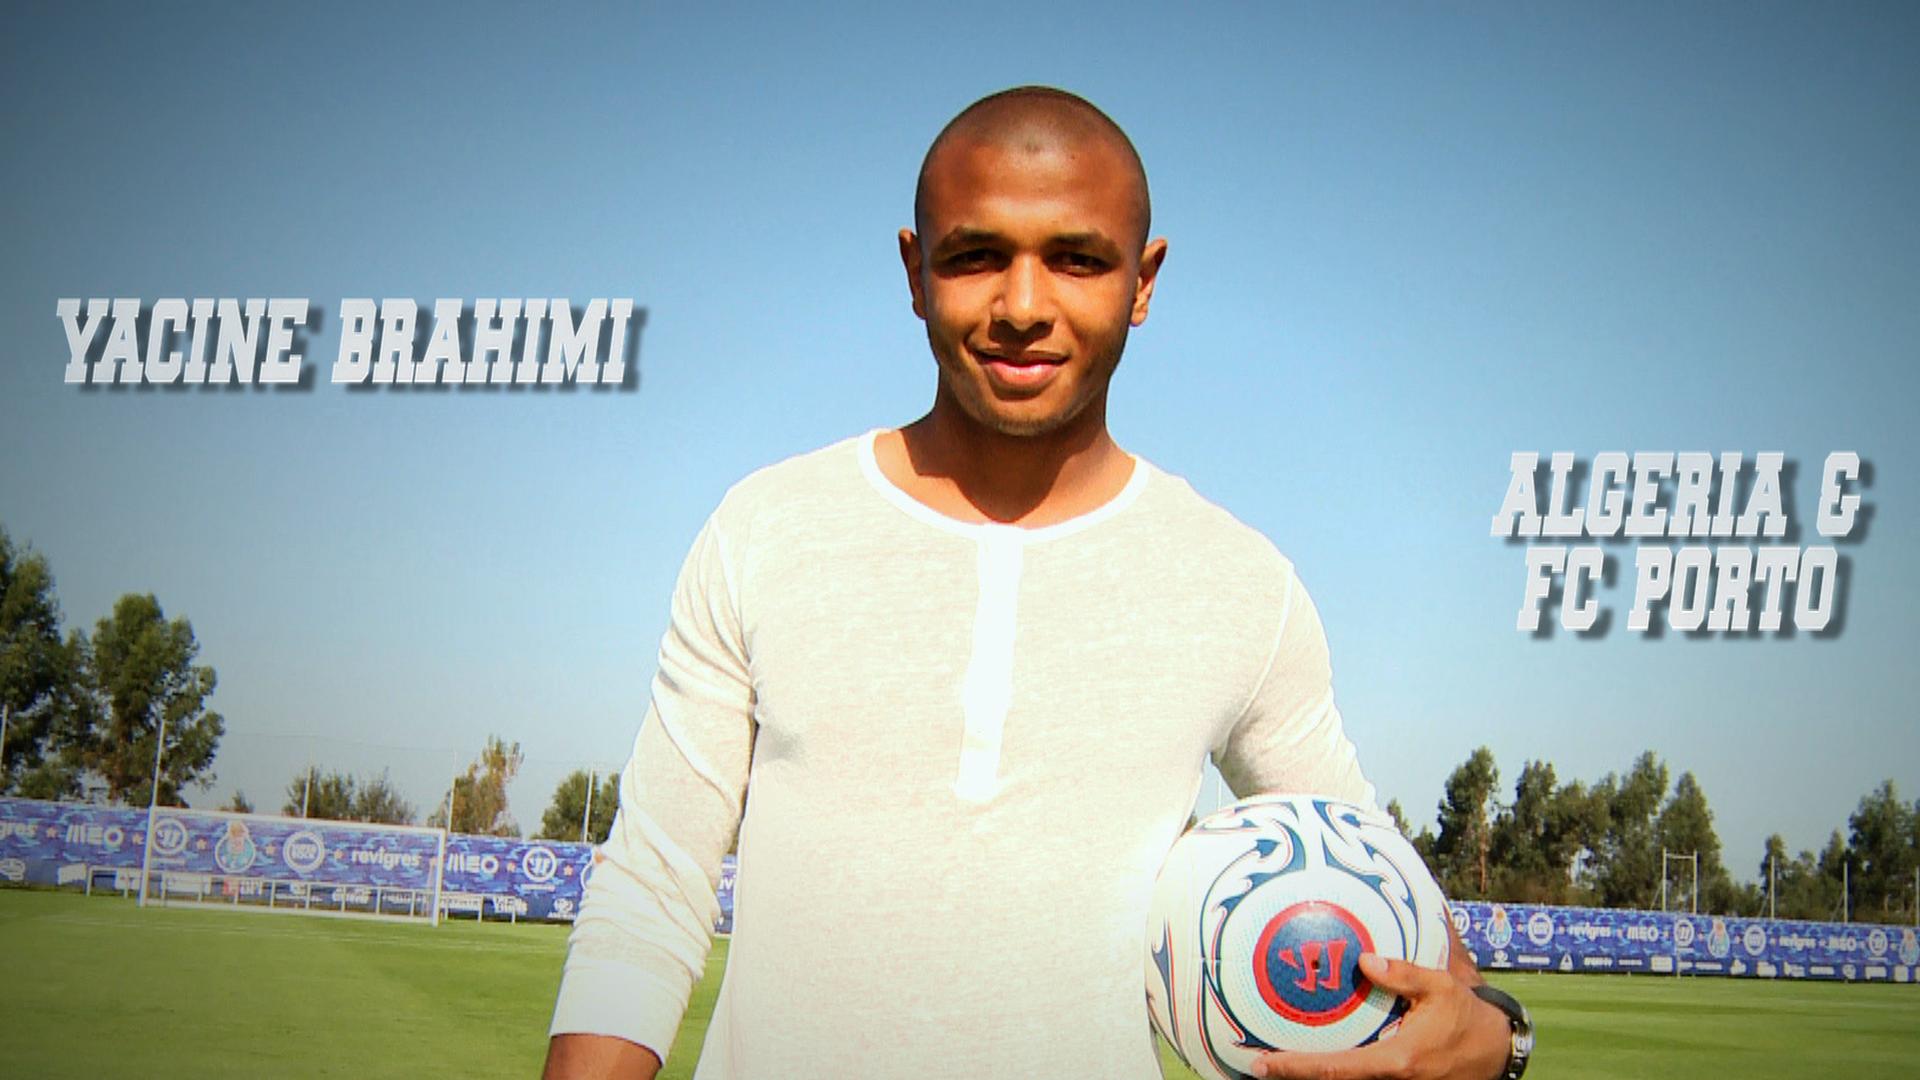 Yacine Brahimi: 2014 BBC African Footballer of the Year nominee